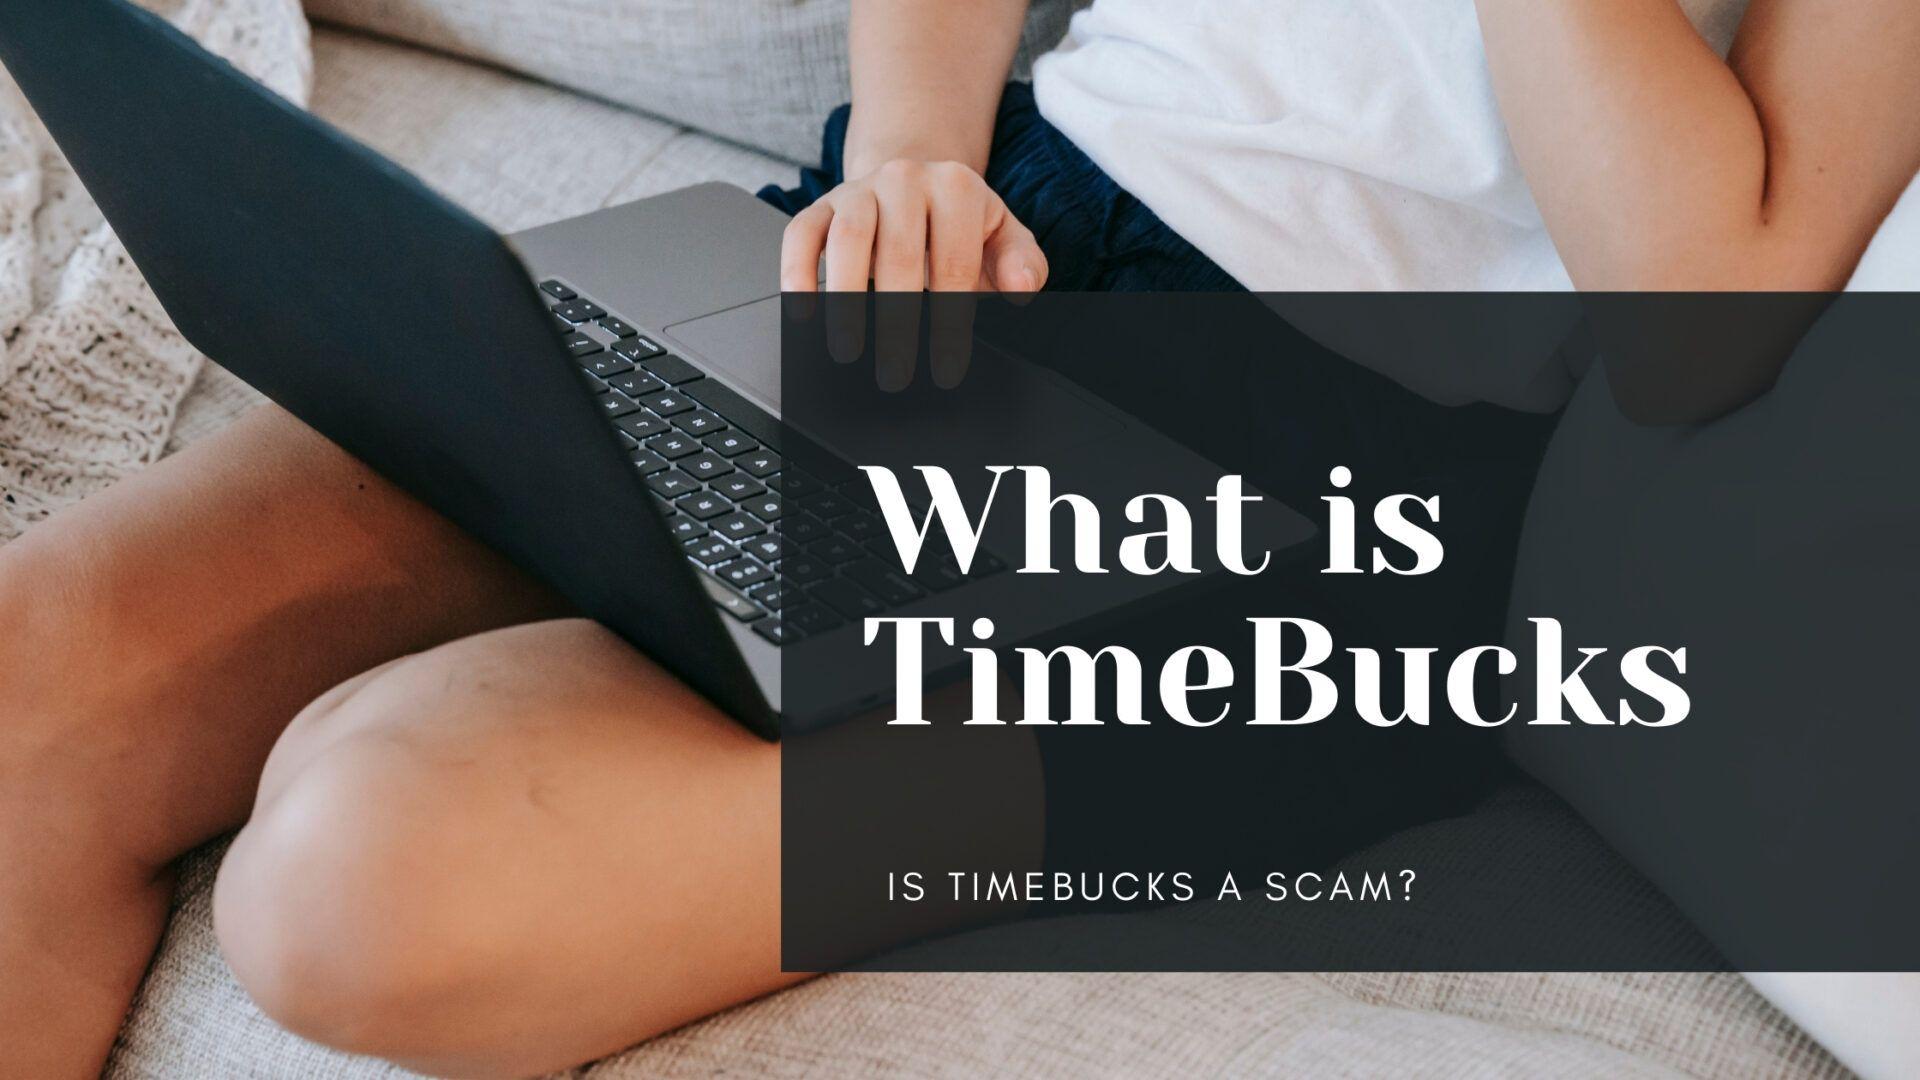 What is TimeBucks